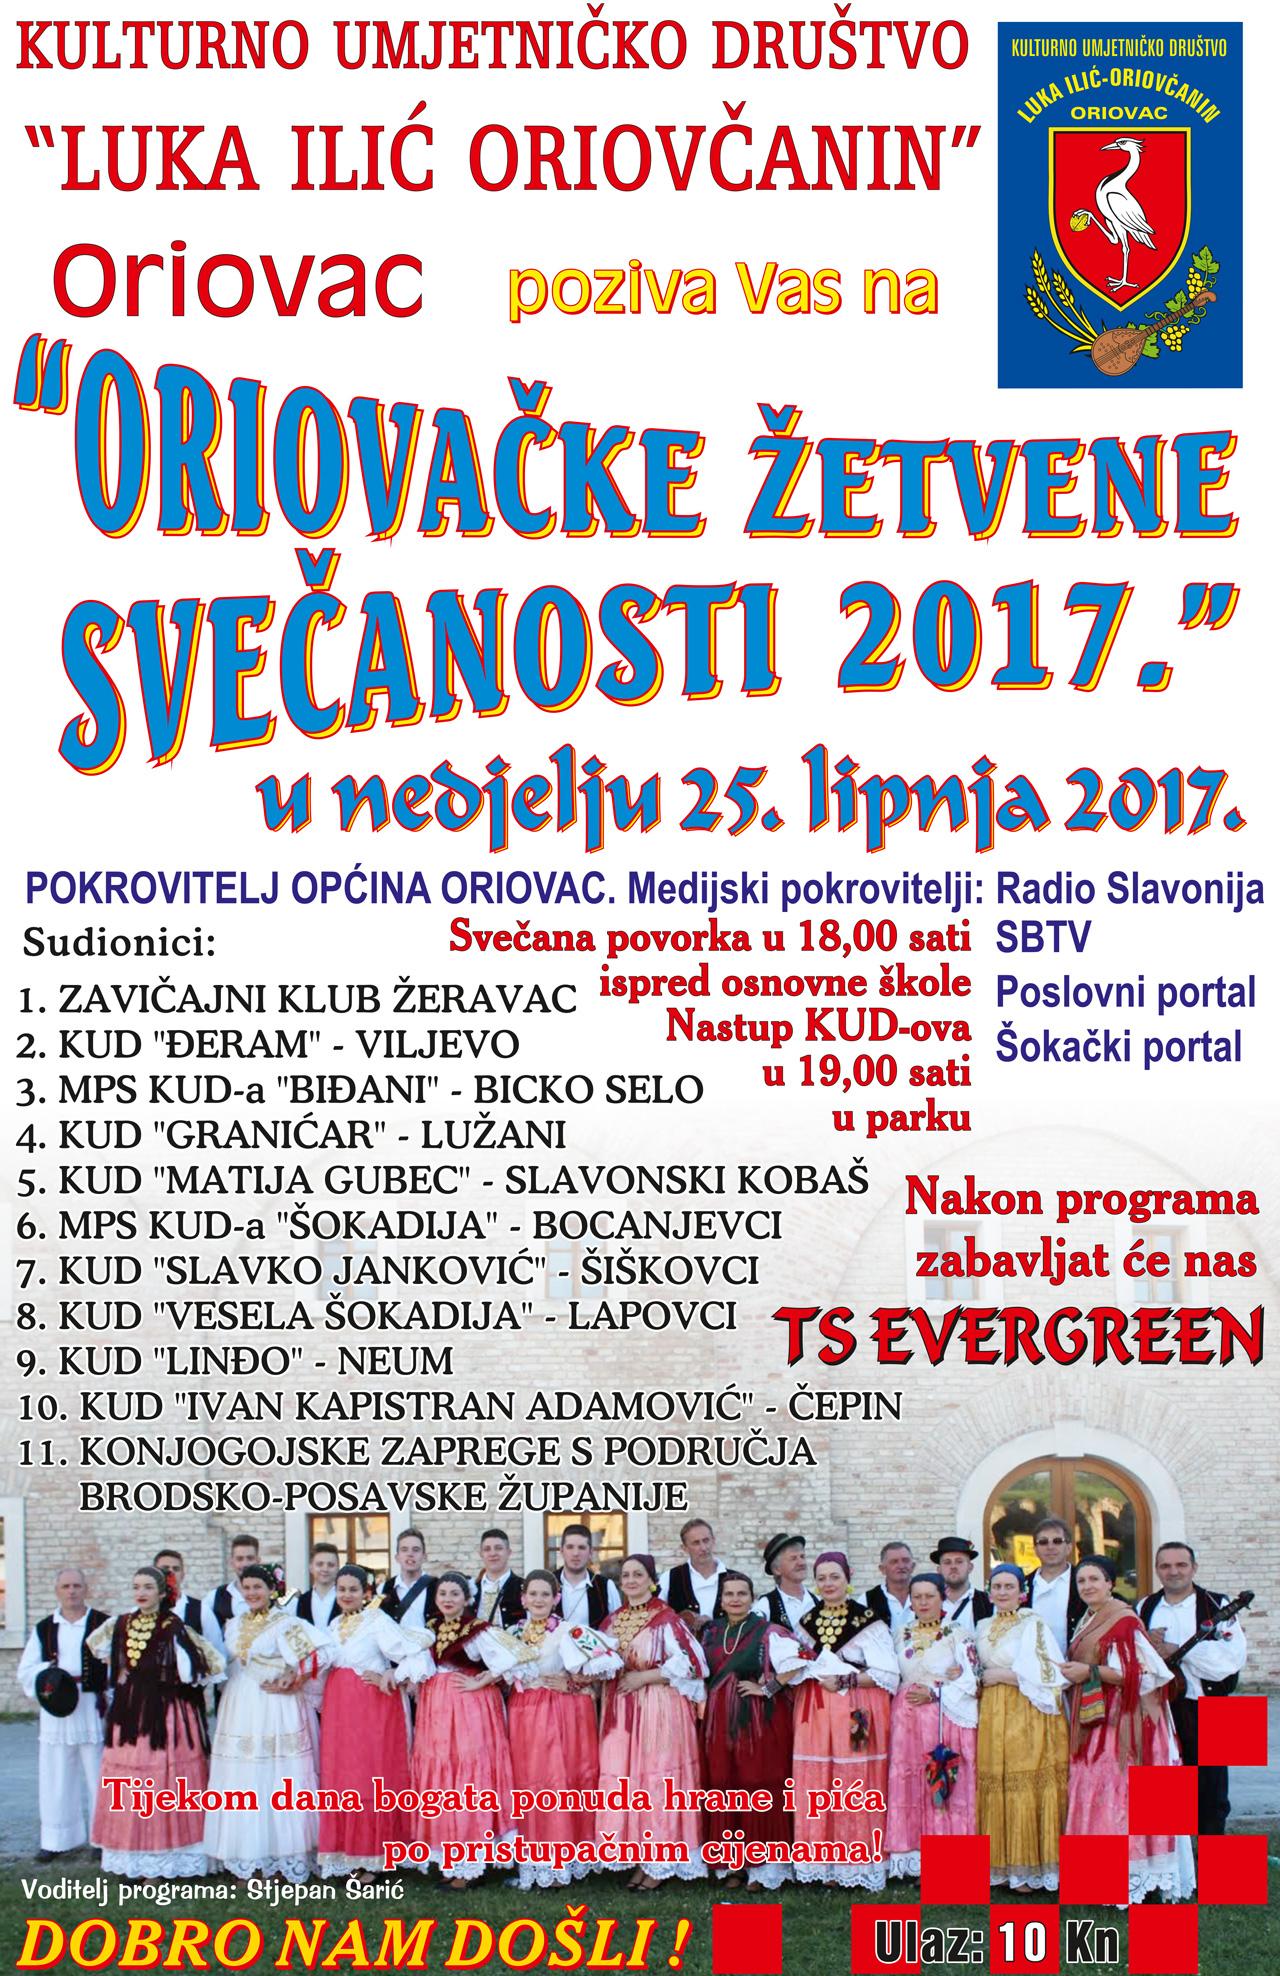 Općina Oriovac poziva na Oriovačke žetvene svečanosti 2017.